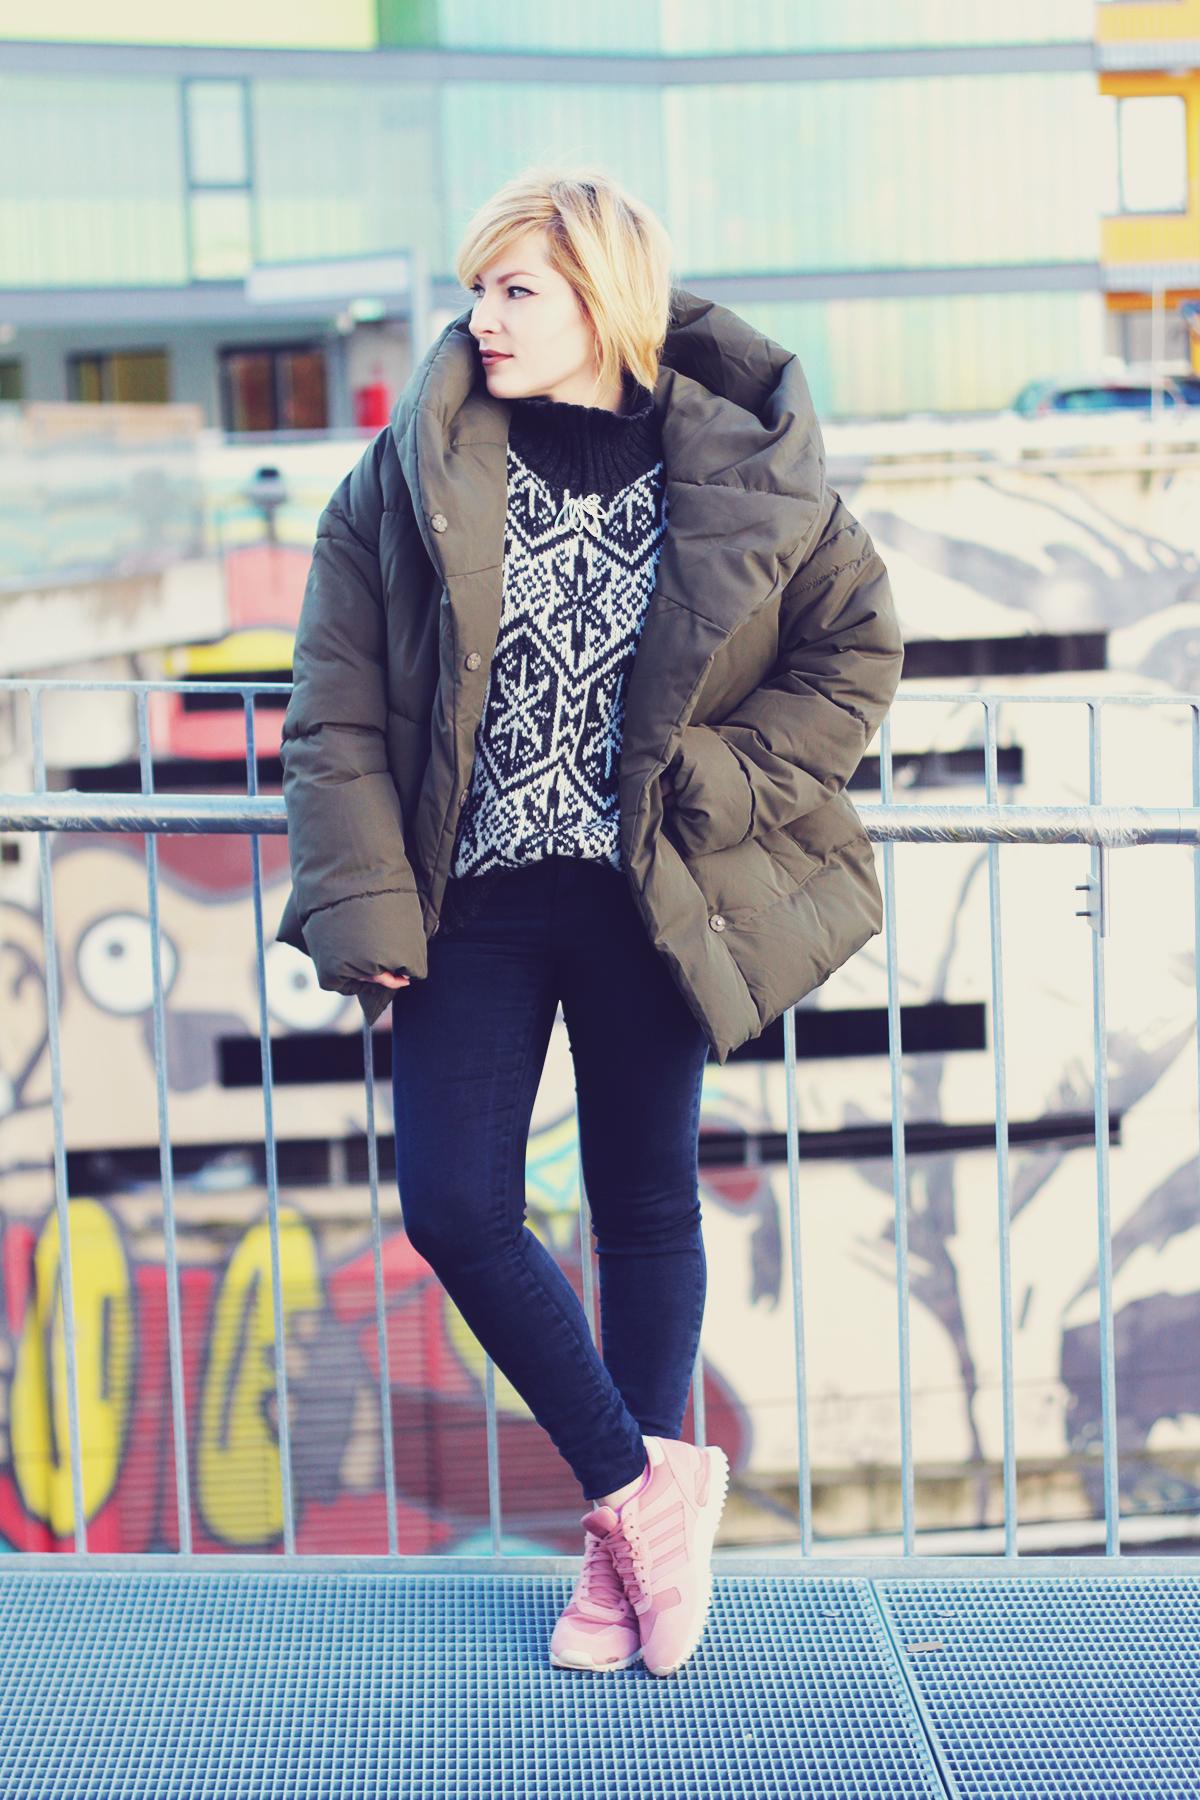 winter fashion, padded jacket, jeans, vintage Swarovski brooch, pink adidas originals, winter sweater, urban landscape, Vienna, graffiti